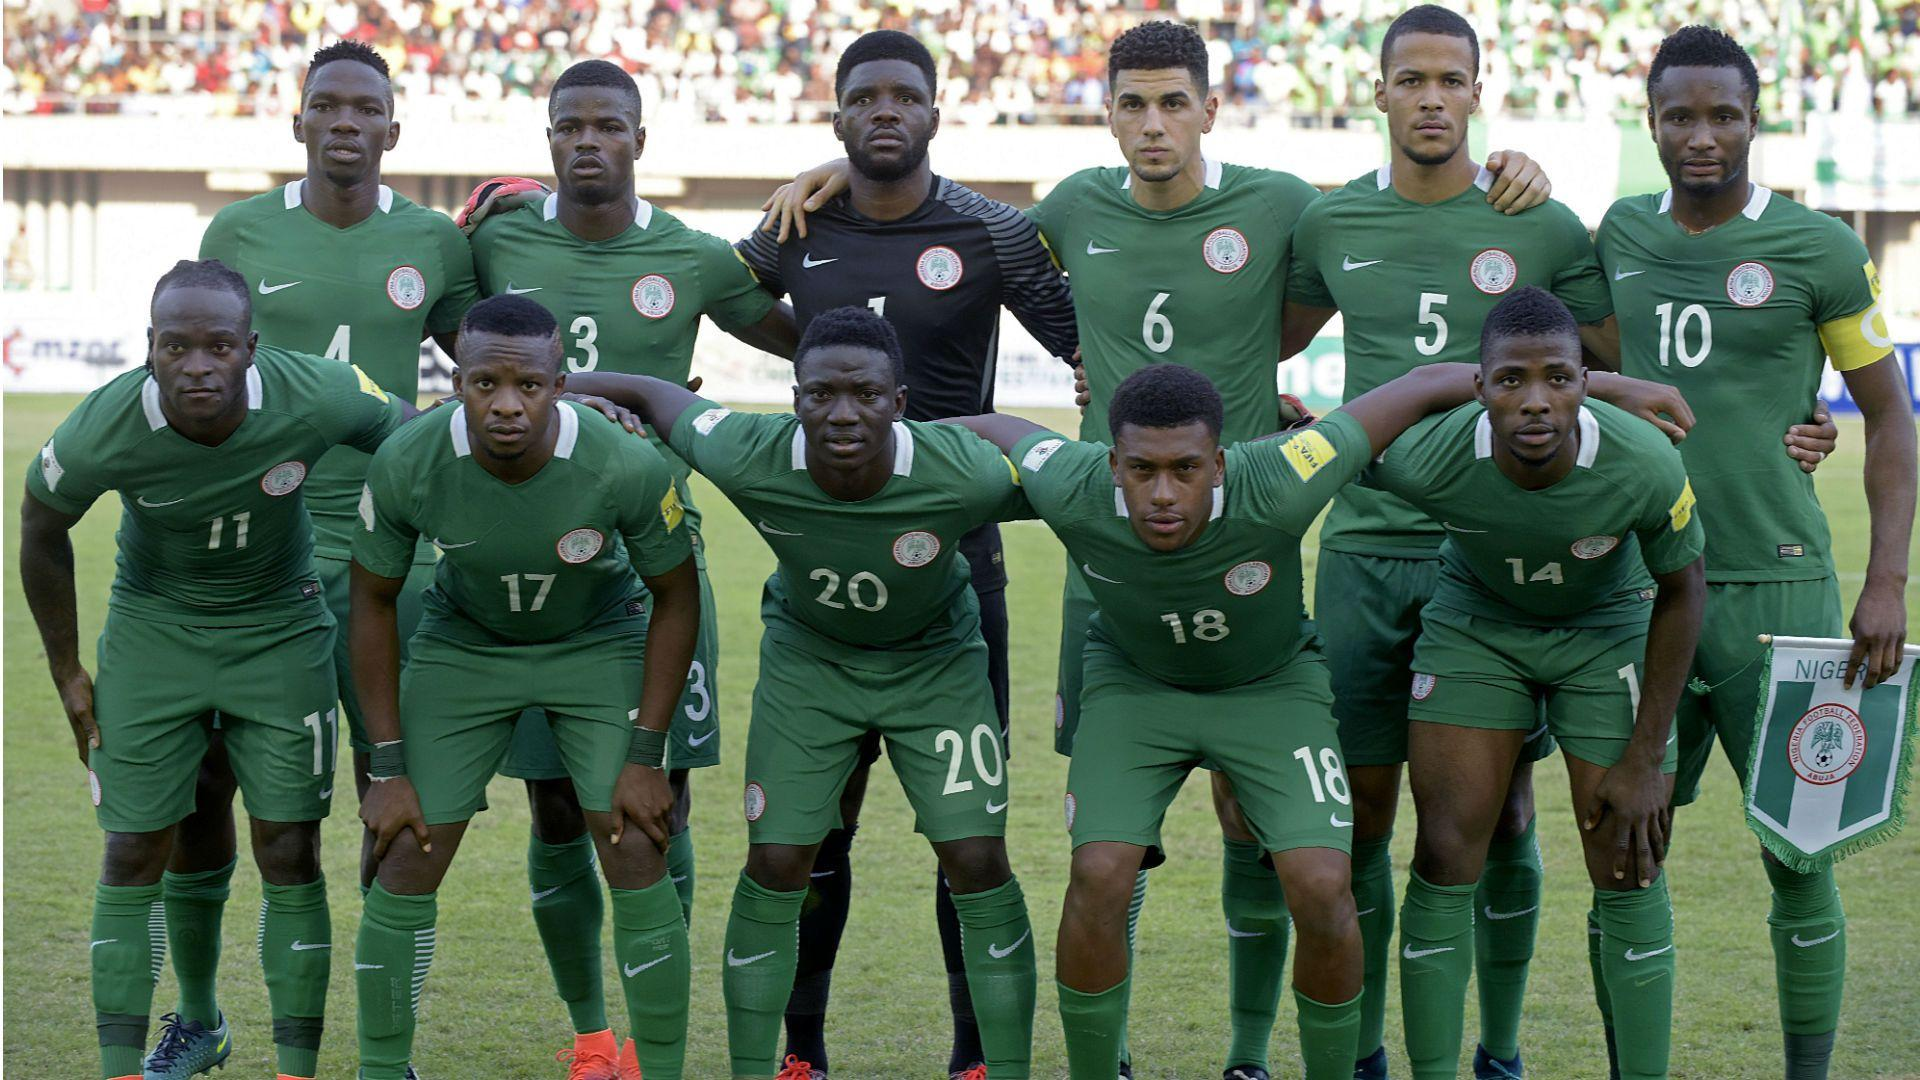 Nigeria National Football Team Background 9